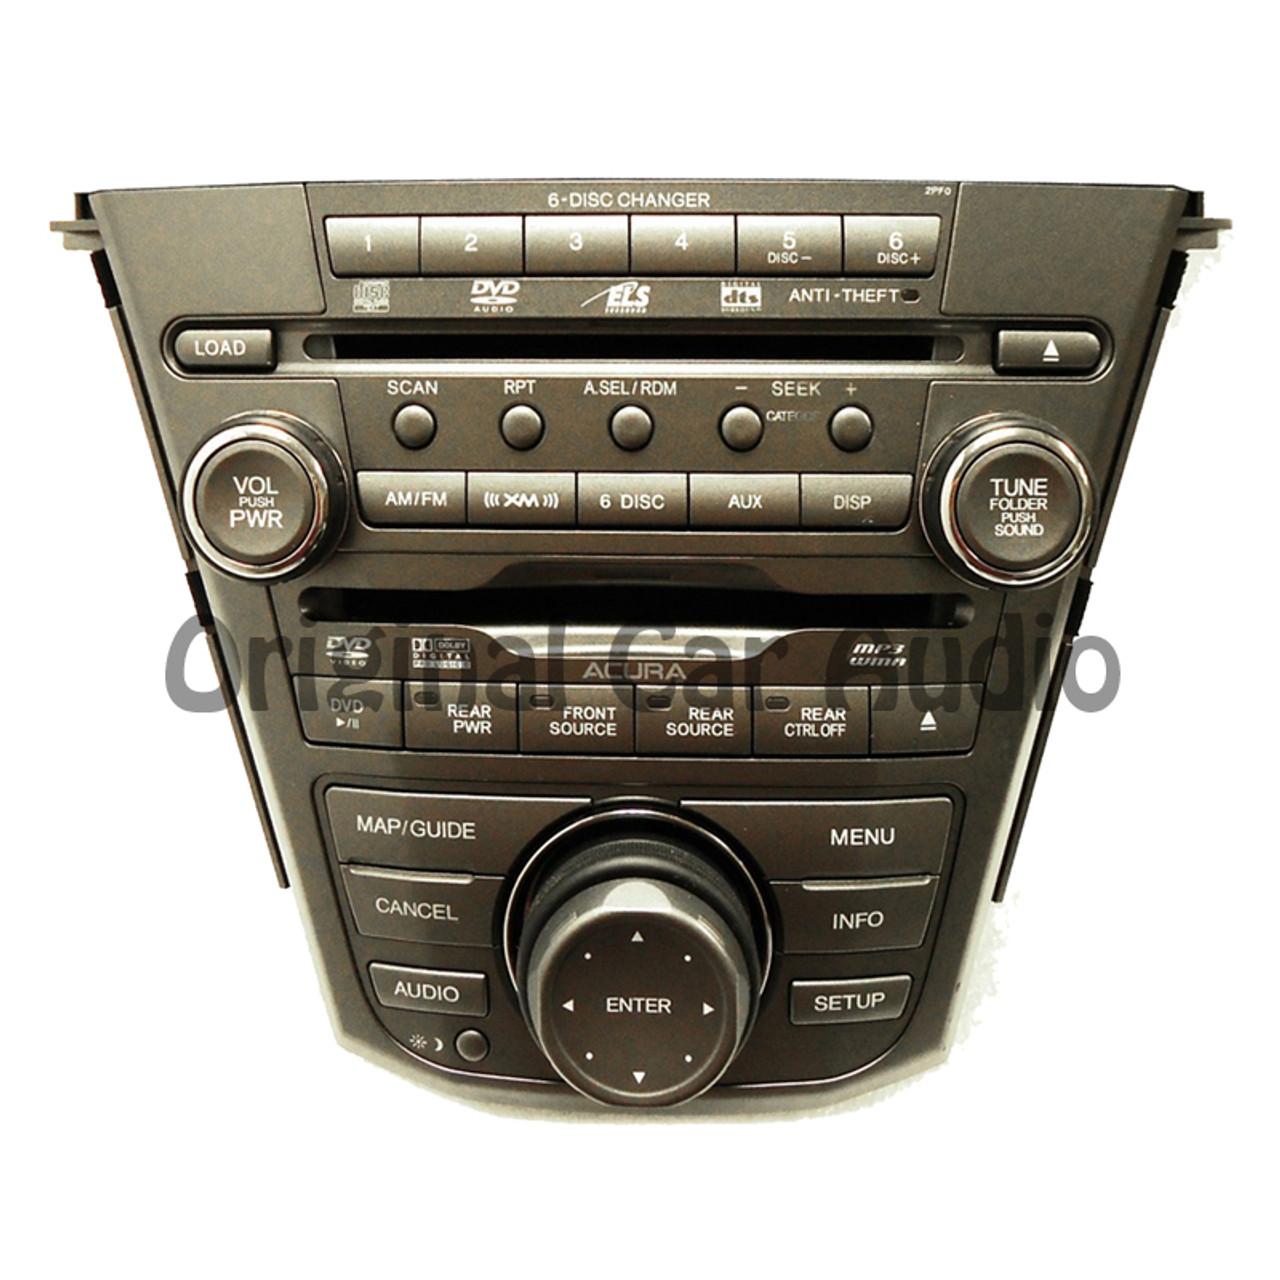 07 08 09 Acura Mdx Xm Satellite Radio 6 Disc Cd Dvd Player Changer Rhcd4car: 2007 Acura Xm Radio At Gmaili.net